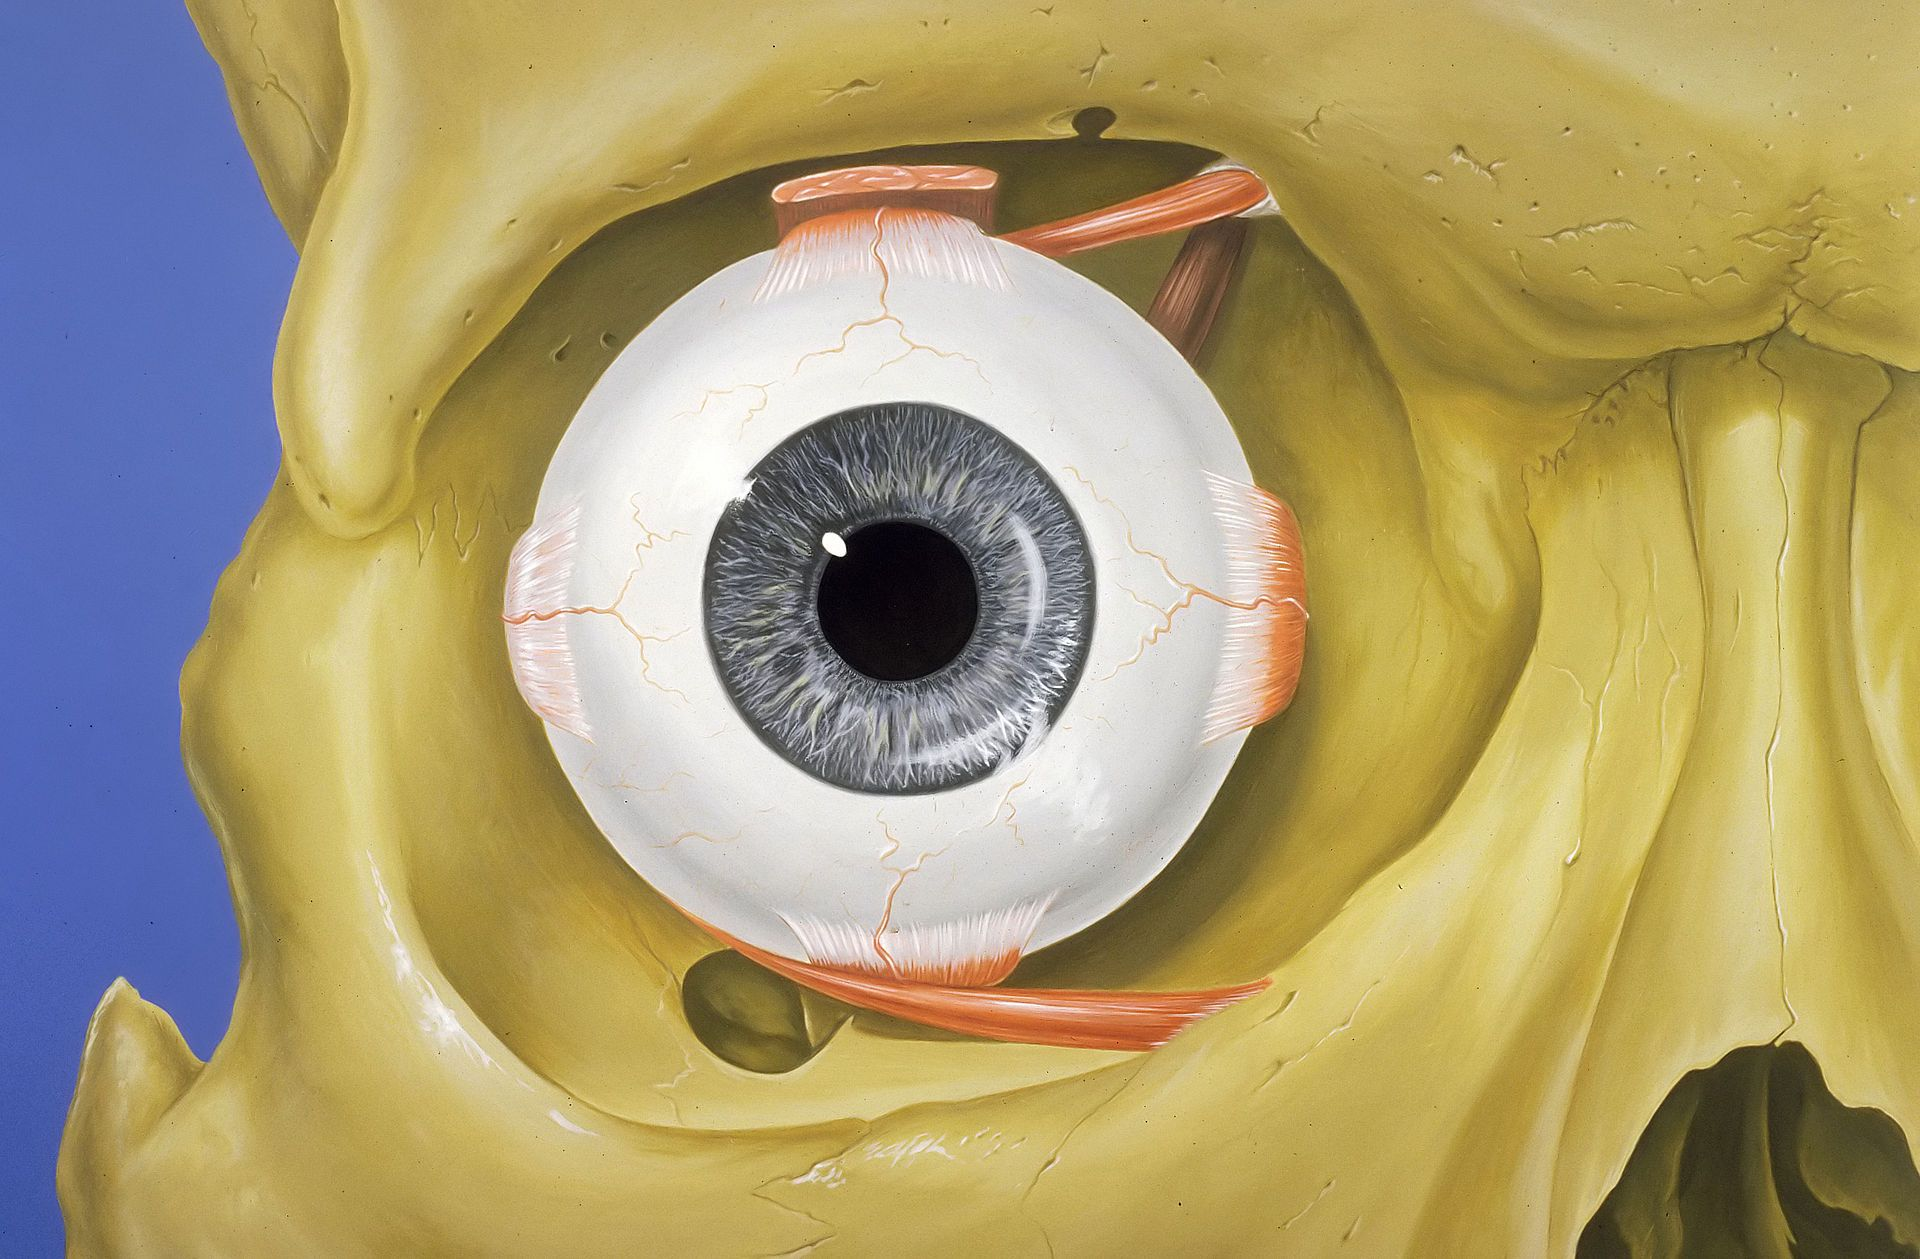 Eye orbit anatomy anterior2 - Human eye - Wikipedia, the free ...